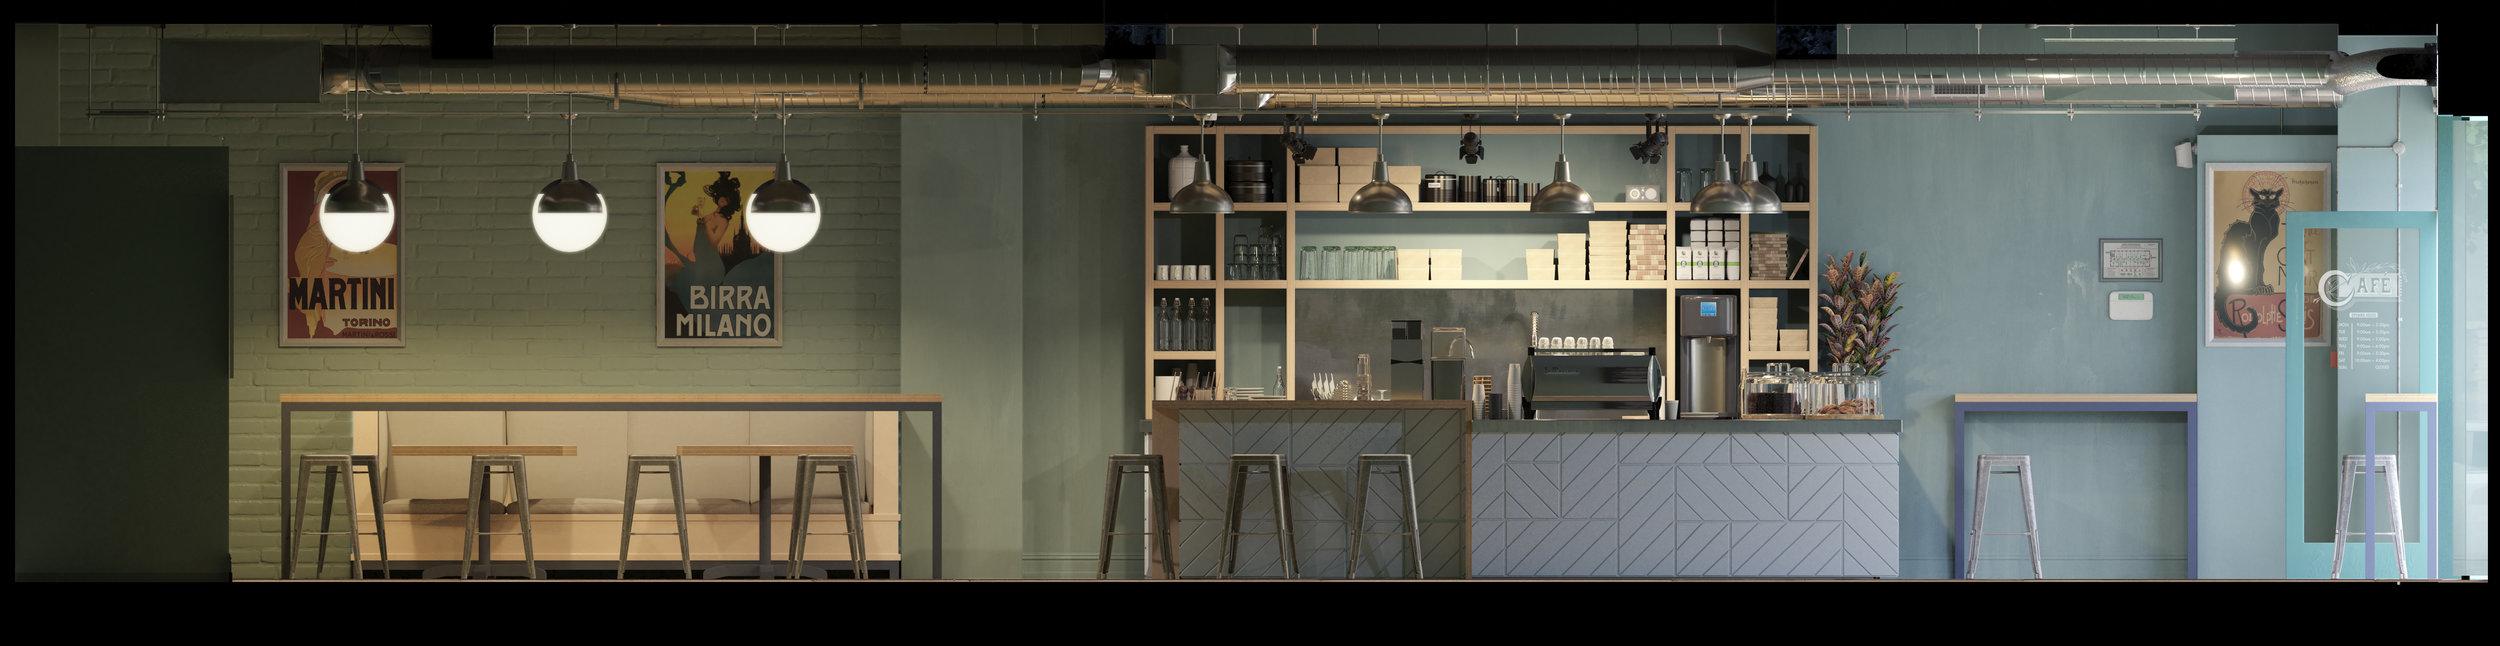 1003_Cafe.jpg